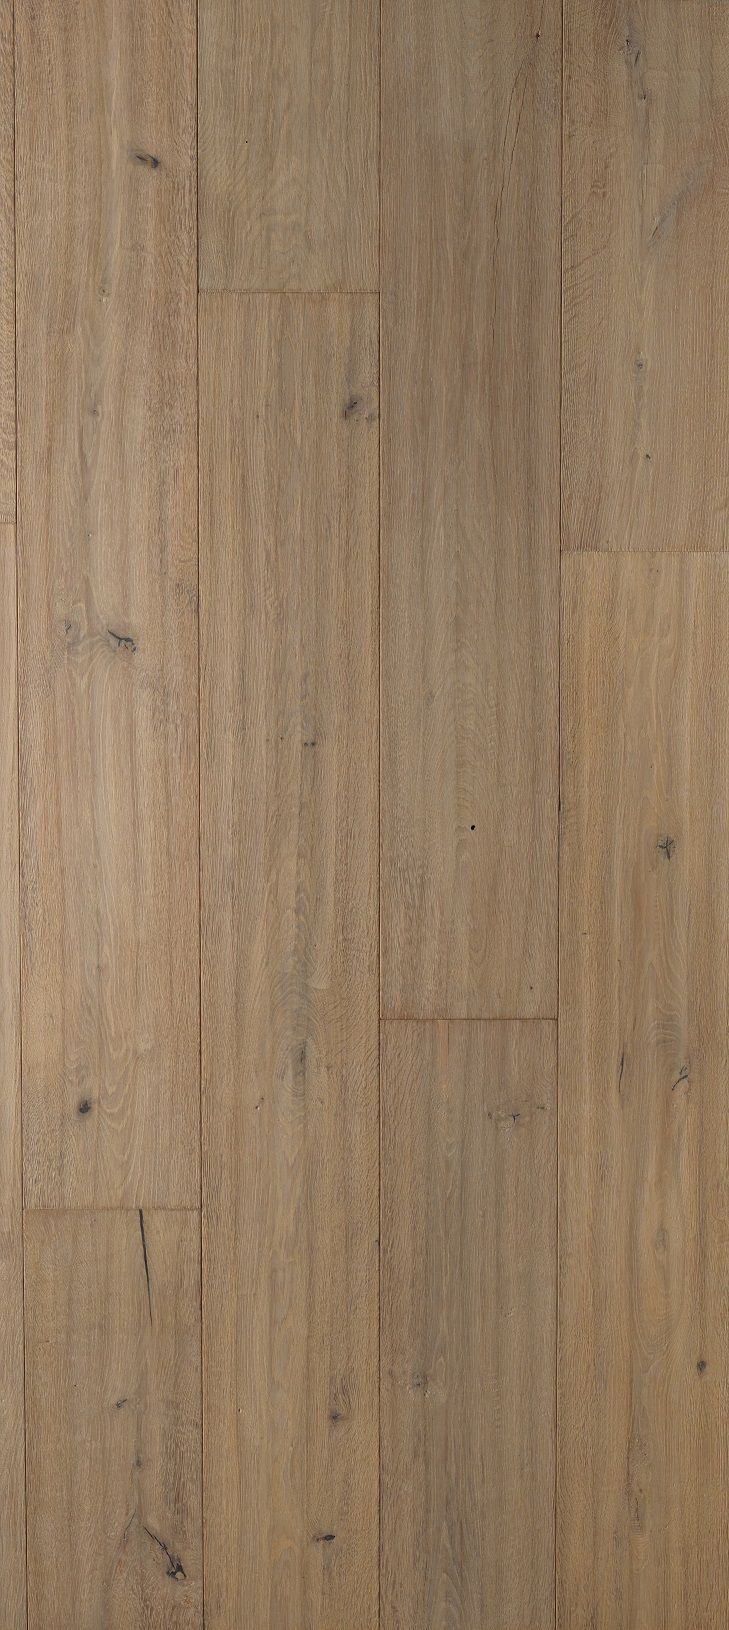 Authentiek verouderde eiken duoplank, zand kleur geolied. Bravoure collectie DE CHILLON 24 cm breed